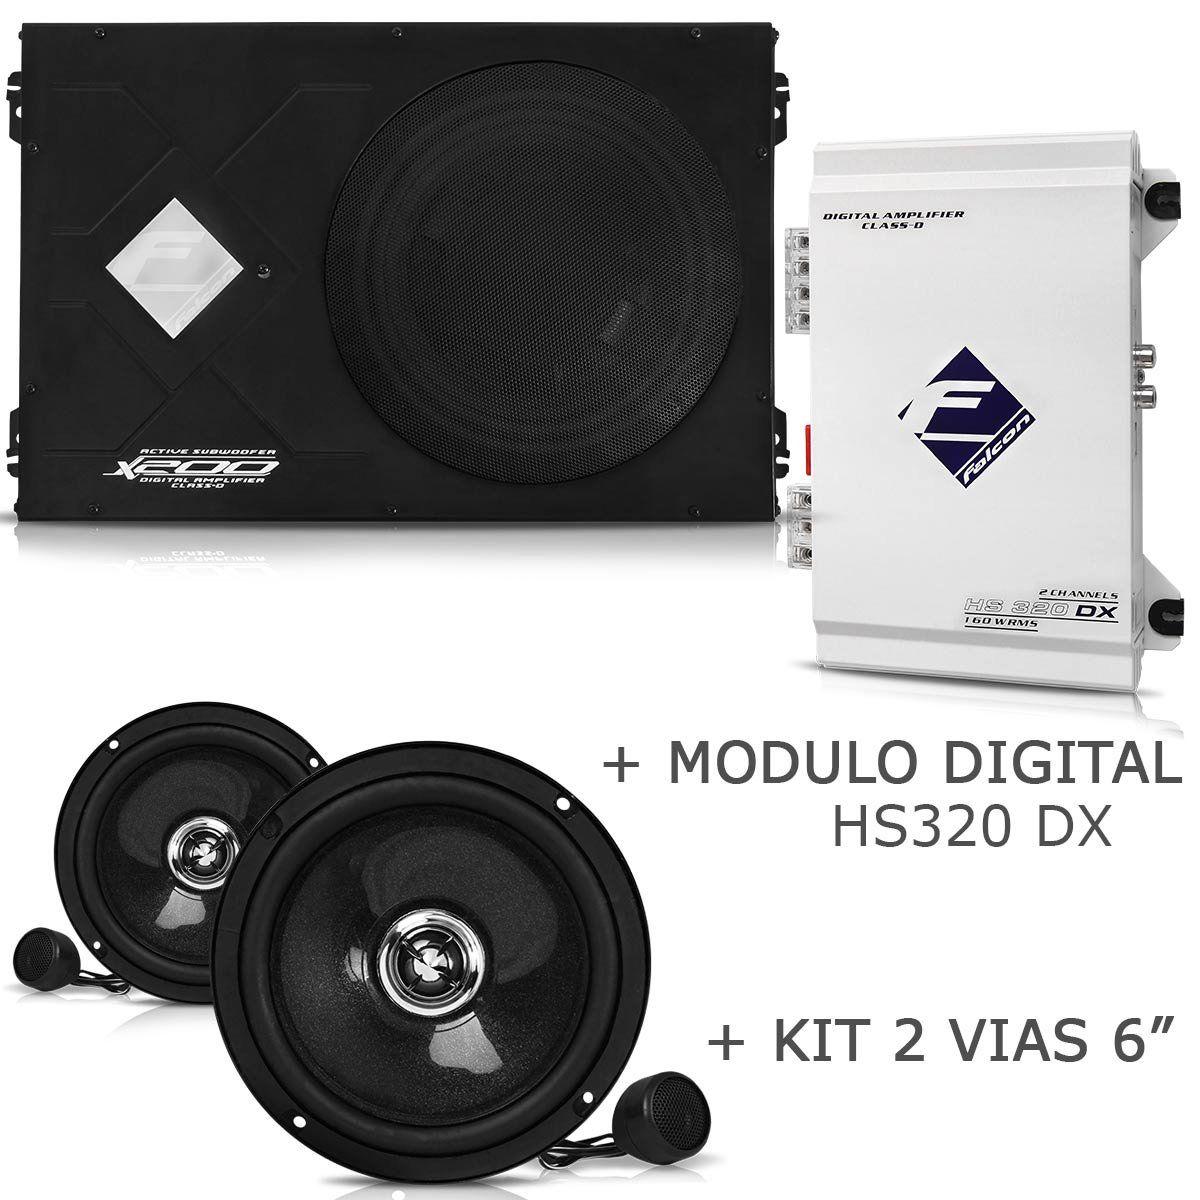 Caixa Slim Falcon X200-slim + Módulo Hs320 Dx + Kit 2 Vias